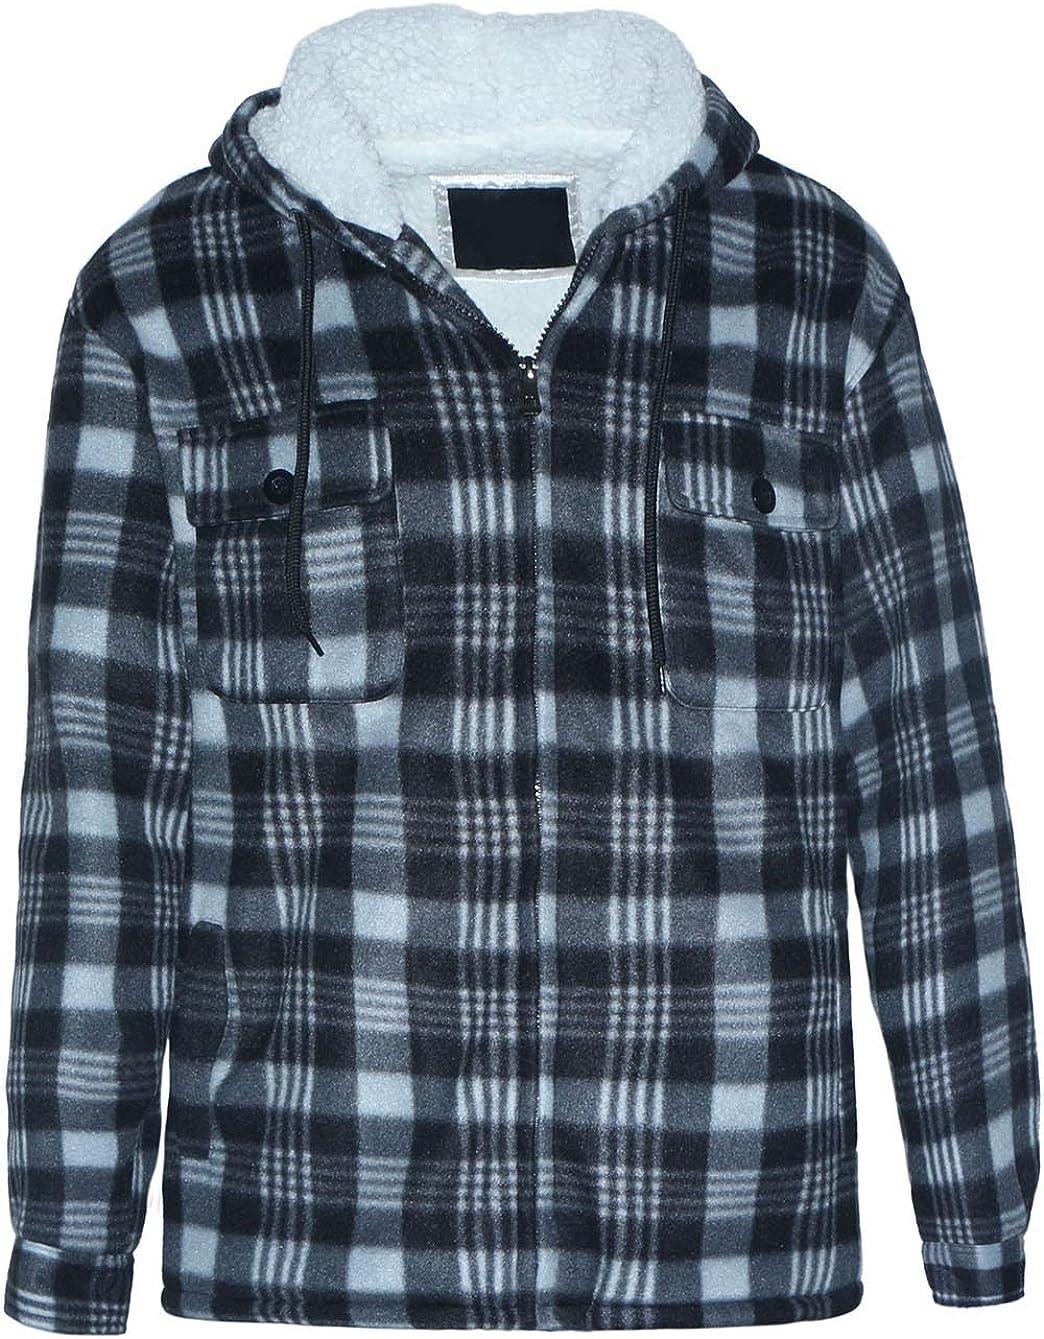 Yasumond Hoodies for Men Zipper Fleece Sweatshirt Heavy Sherpa Lined Hooded Warm Winter Coats Big Tall